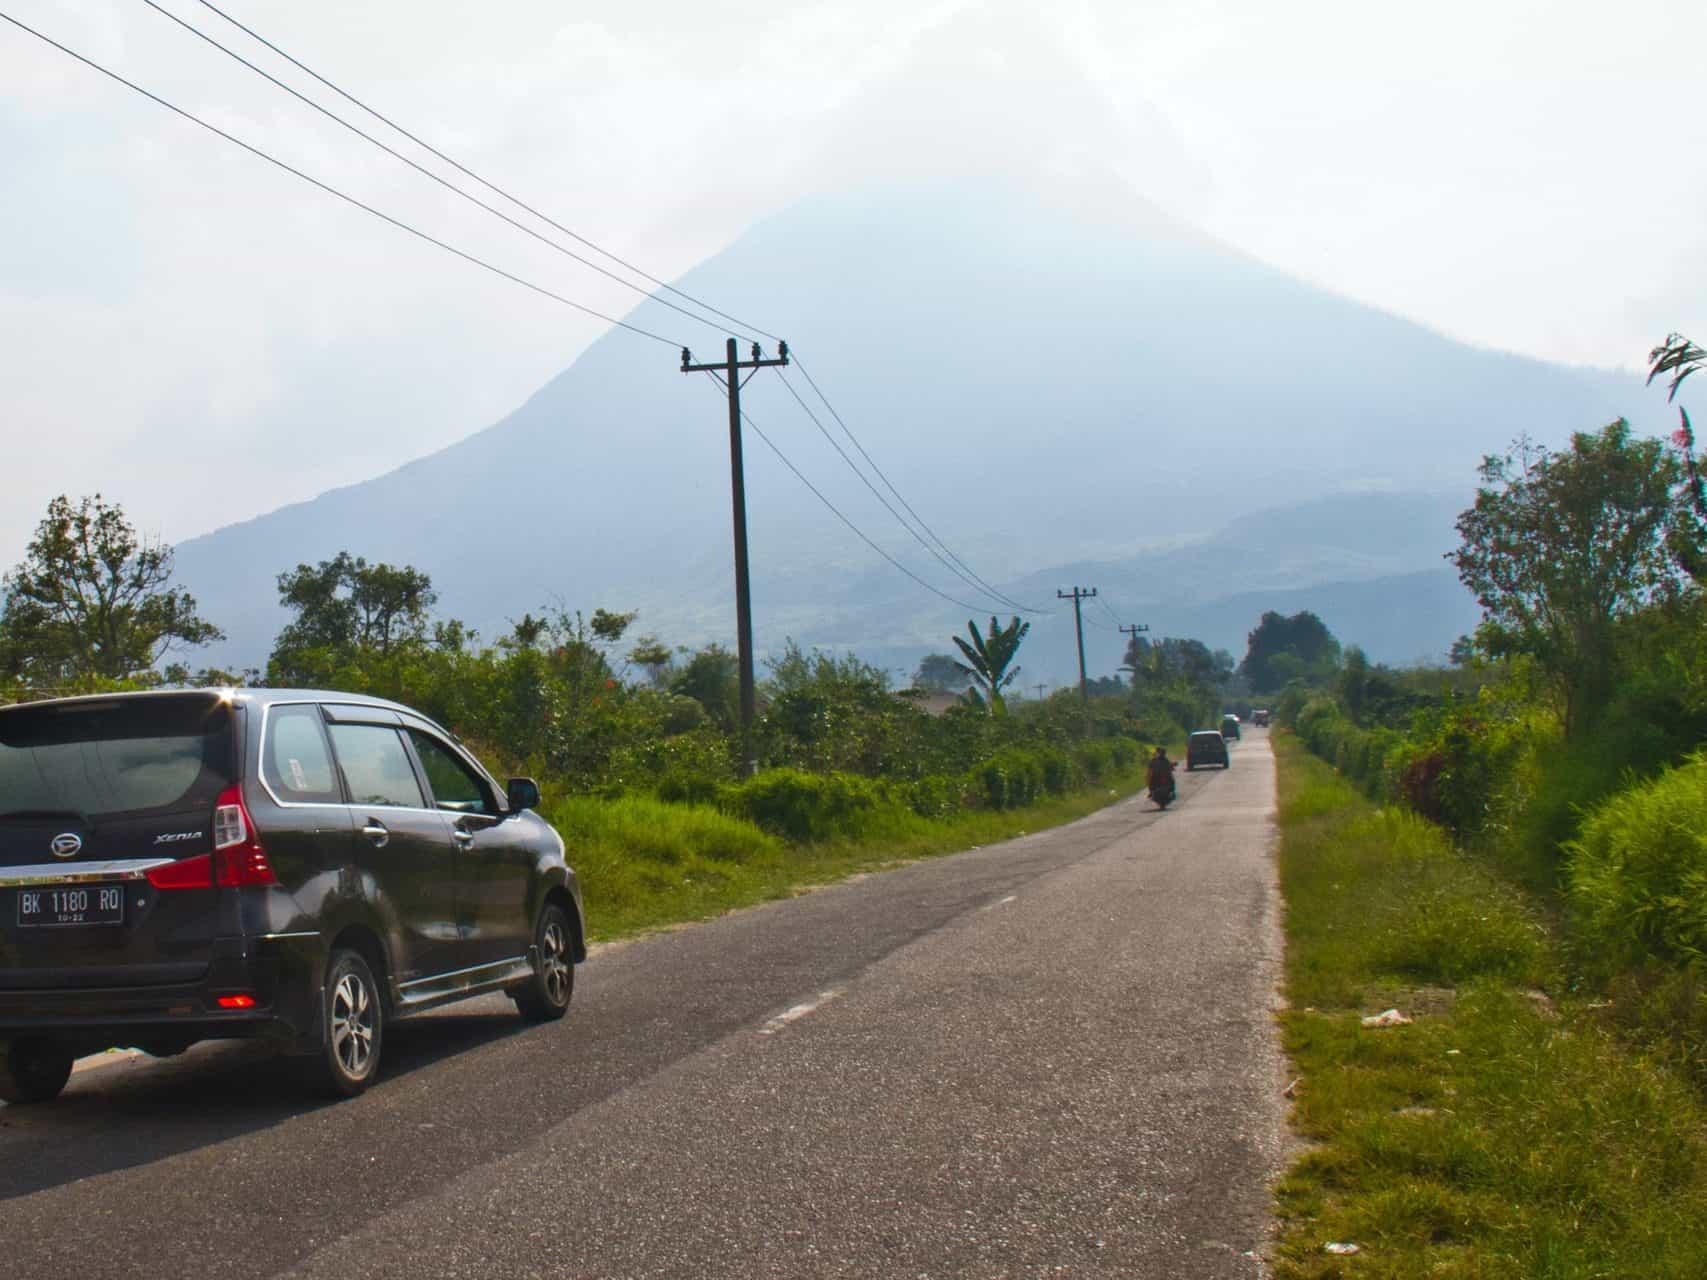 EcoTravel Transfer from Bukit Lawang to the Lake Toba - Berastagi volcano & Lake Toba - Sumatra Highlights by Sumatra EcoTravel